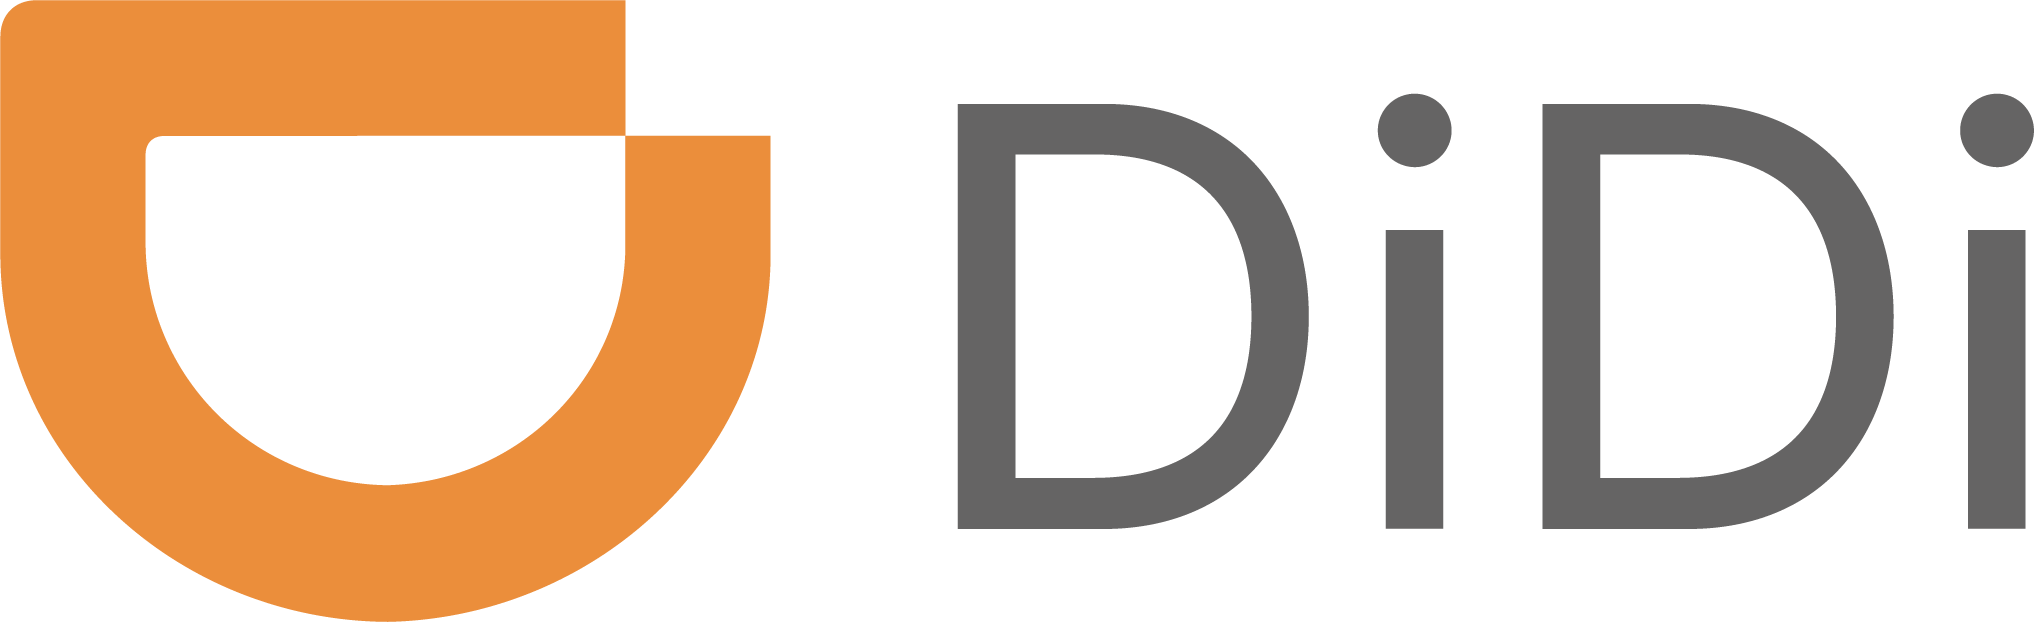 didichuxing-logo